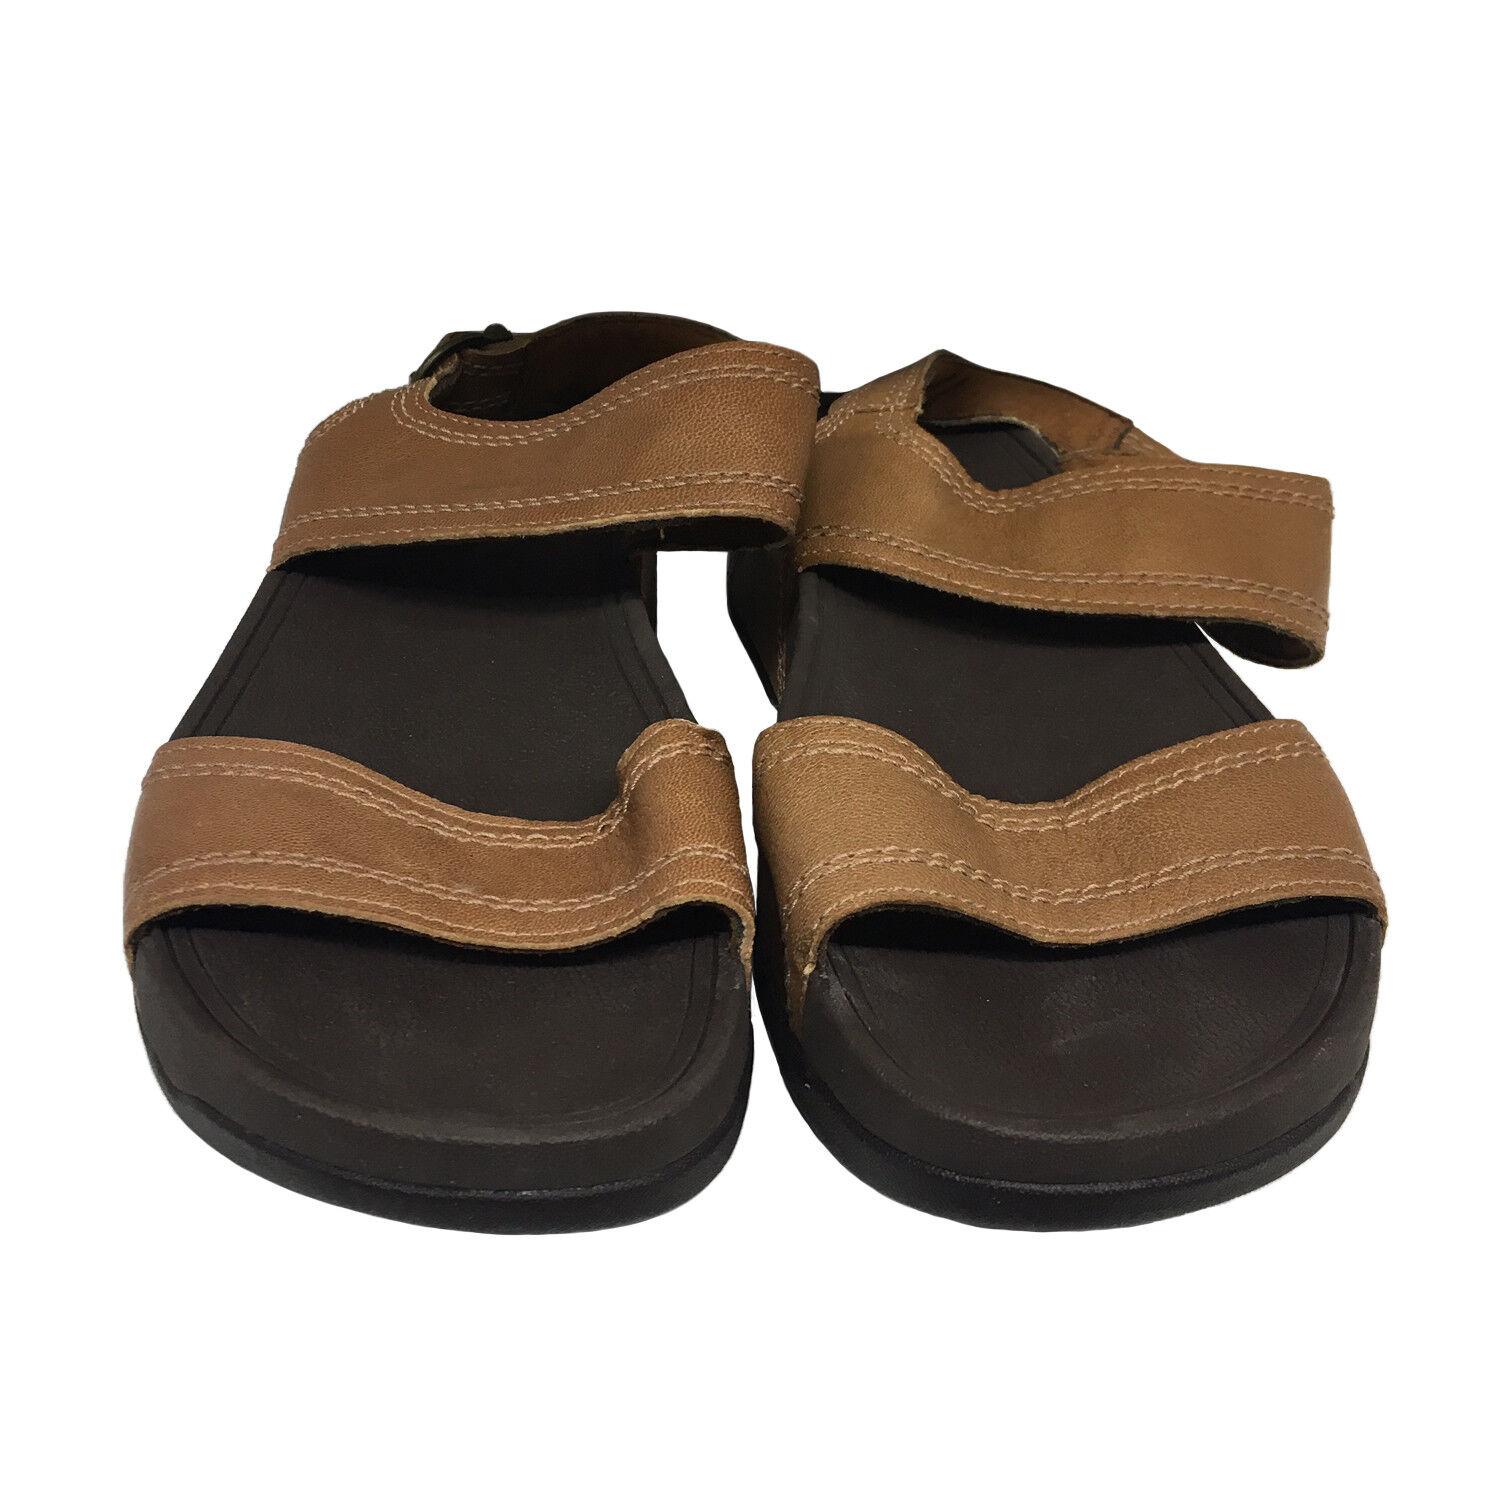 FIT FLOP scarpa tan donna cuoio toffee tan scarpa tan tan POSITANO plantare   cb957d